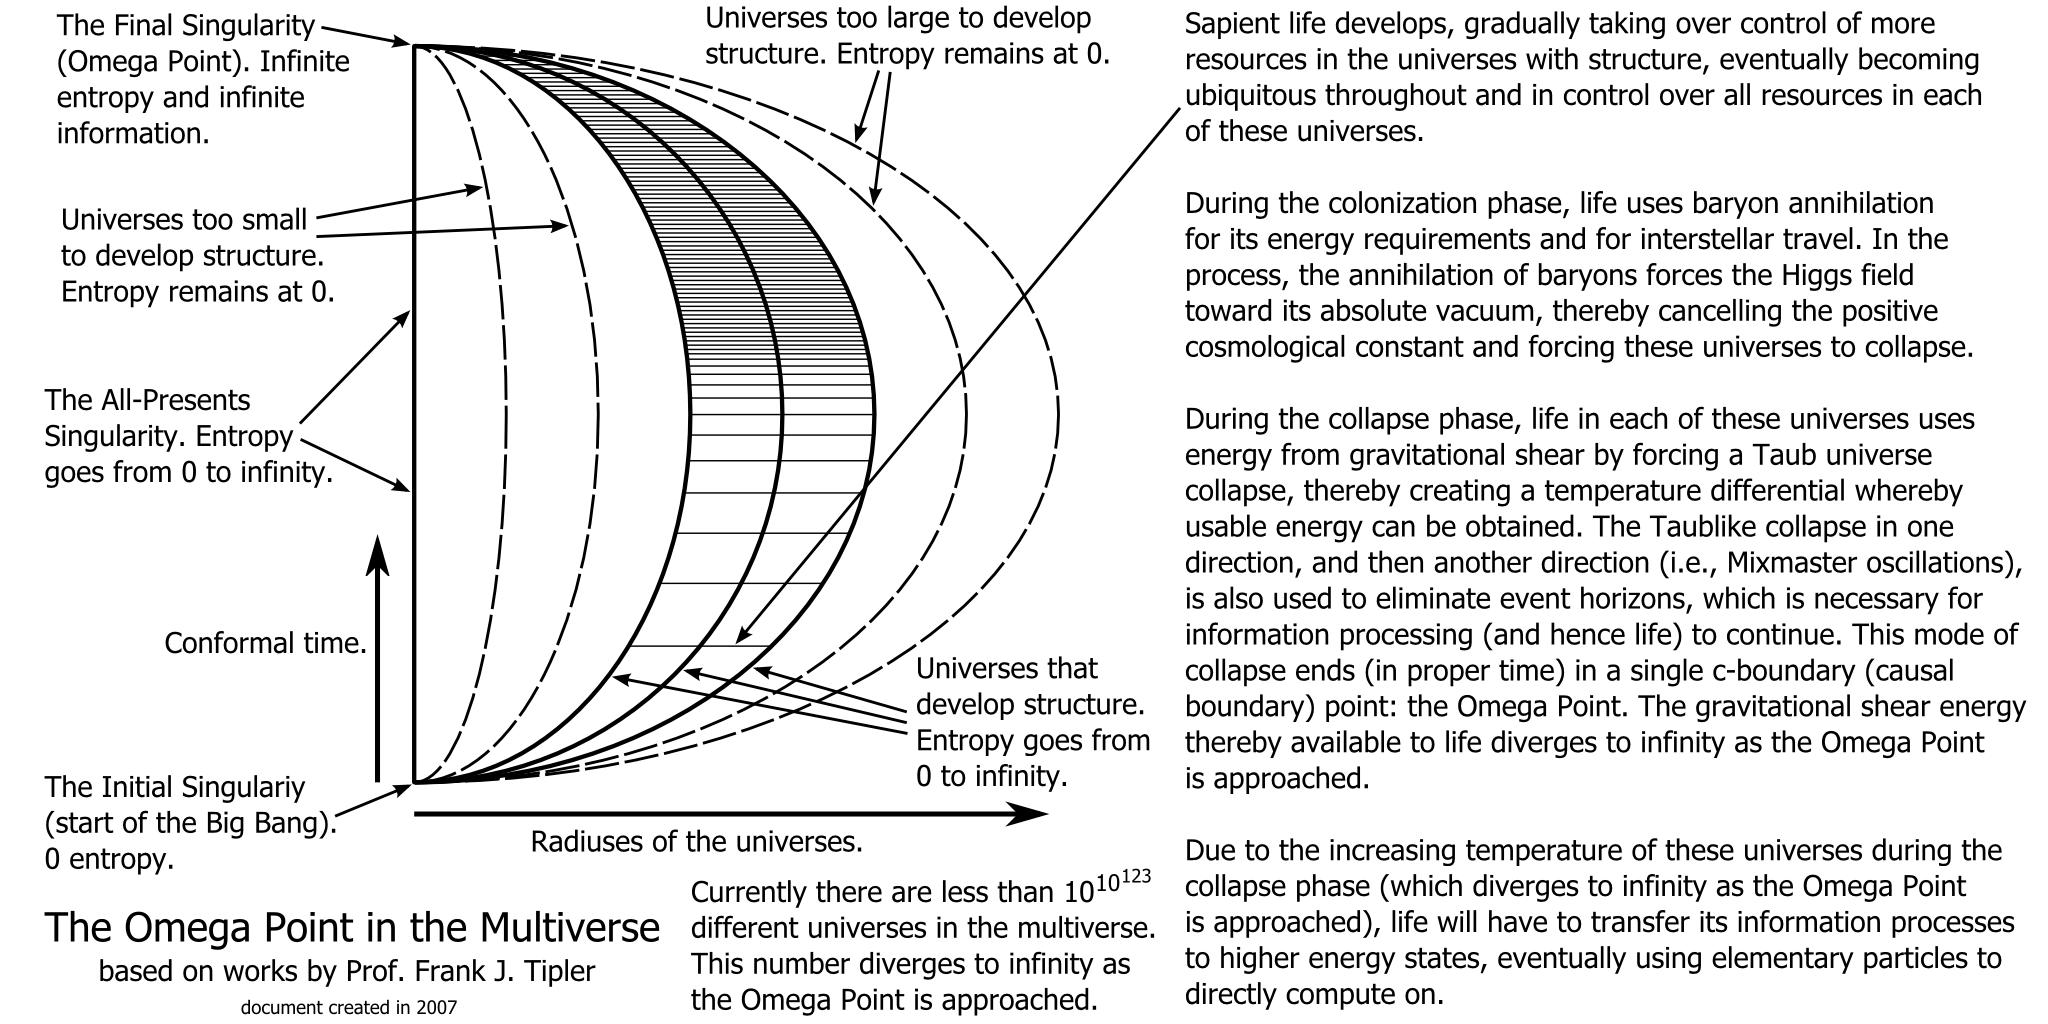 Multiverse Theory Diagram | www.imgkid.com - The Image Kid ...